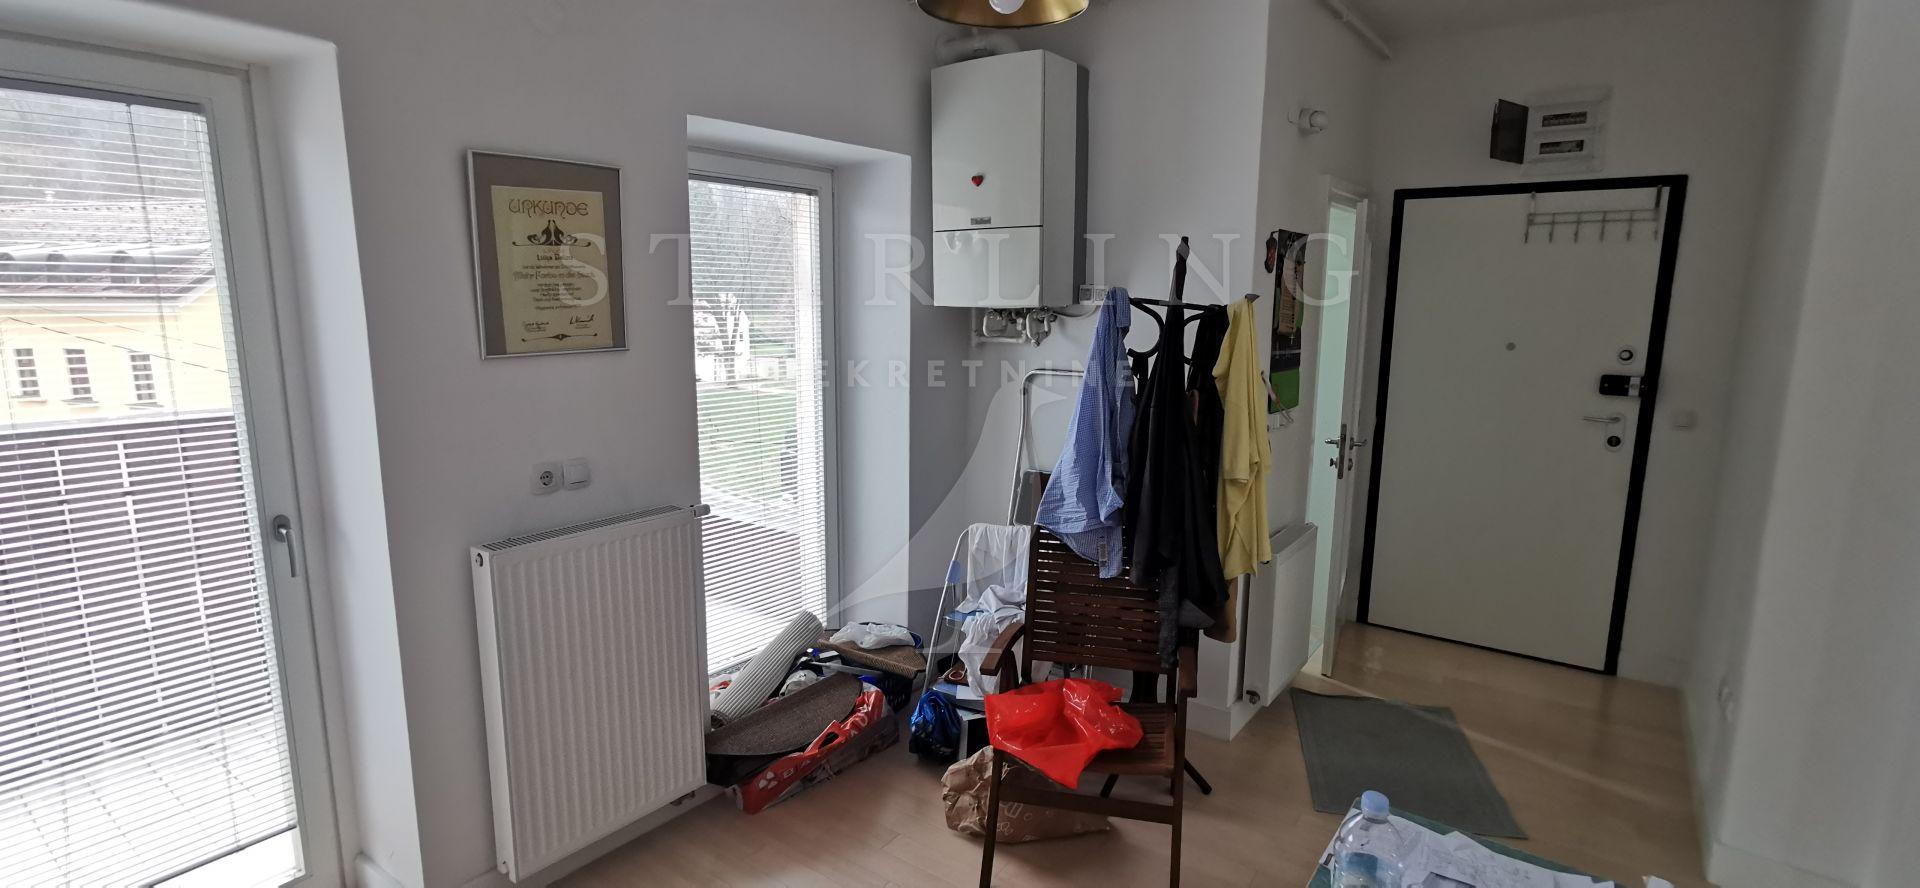 STAN, PRODAJA, SAMOBOR, CENTAR, 84 m2, 2 apartmana